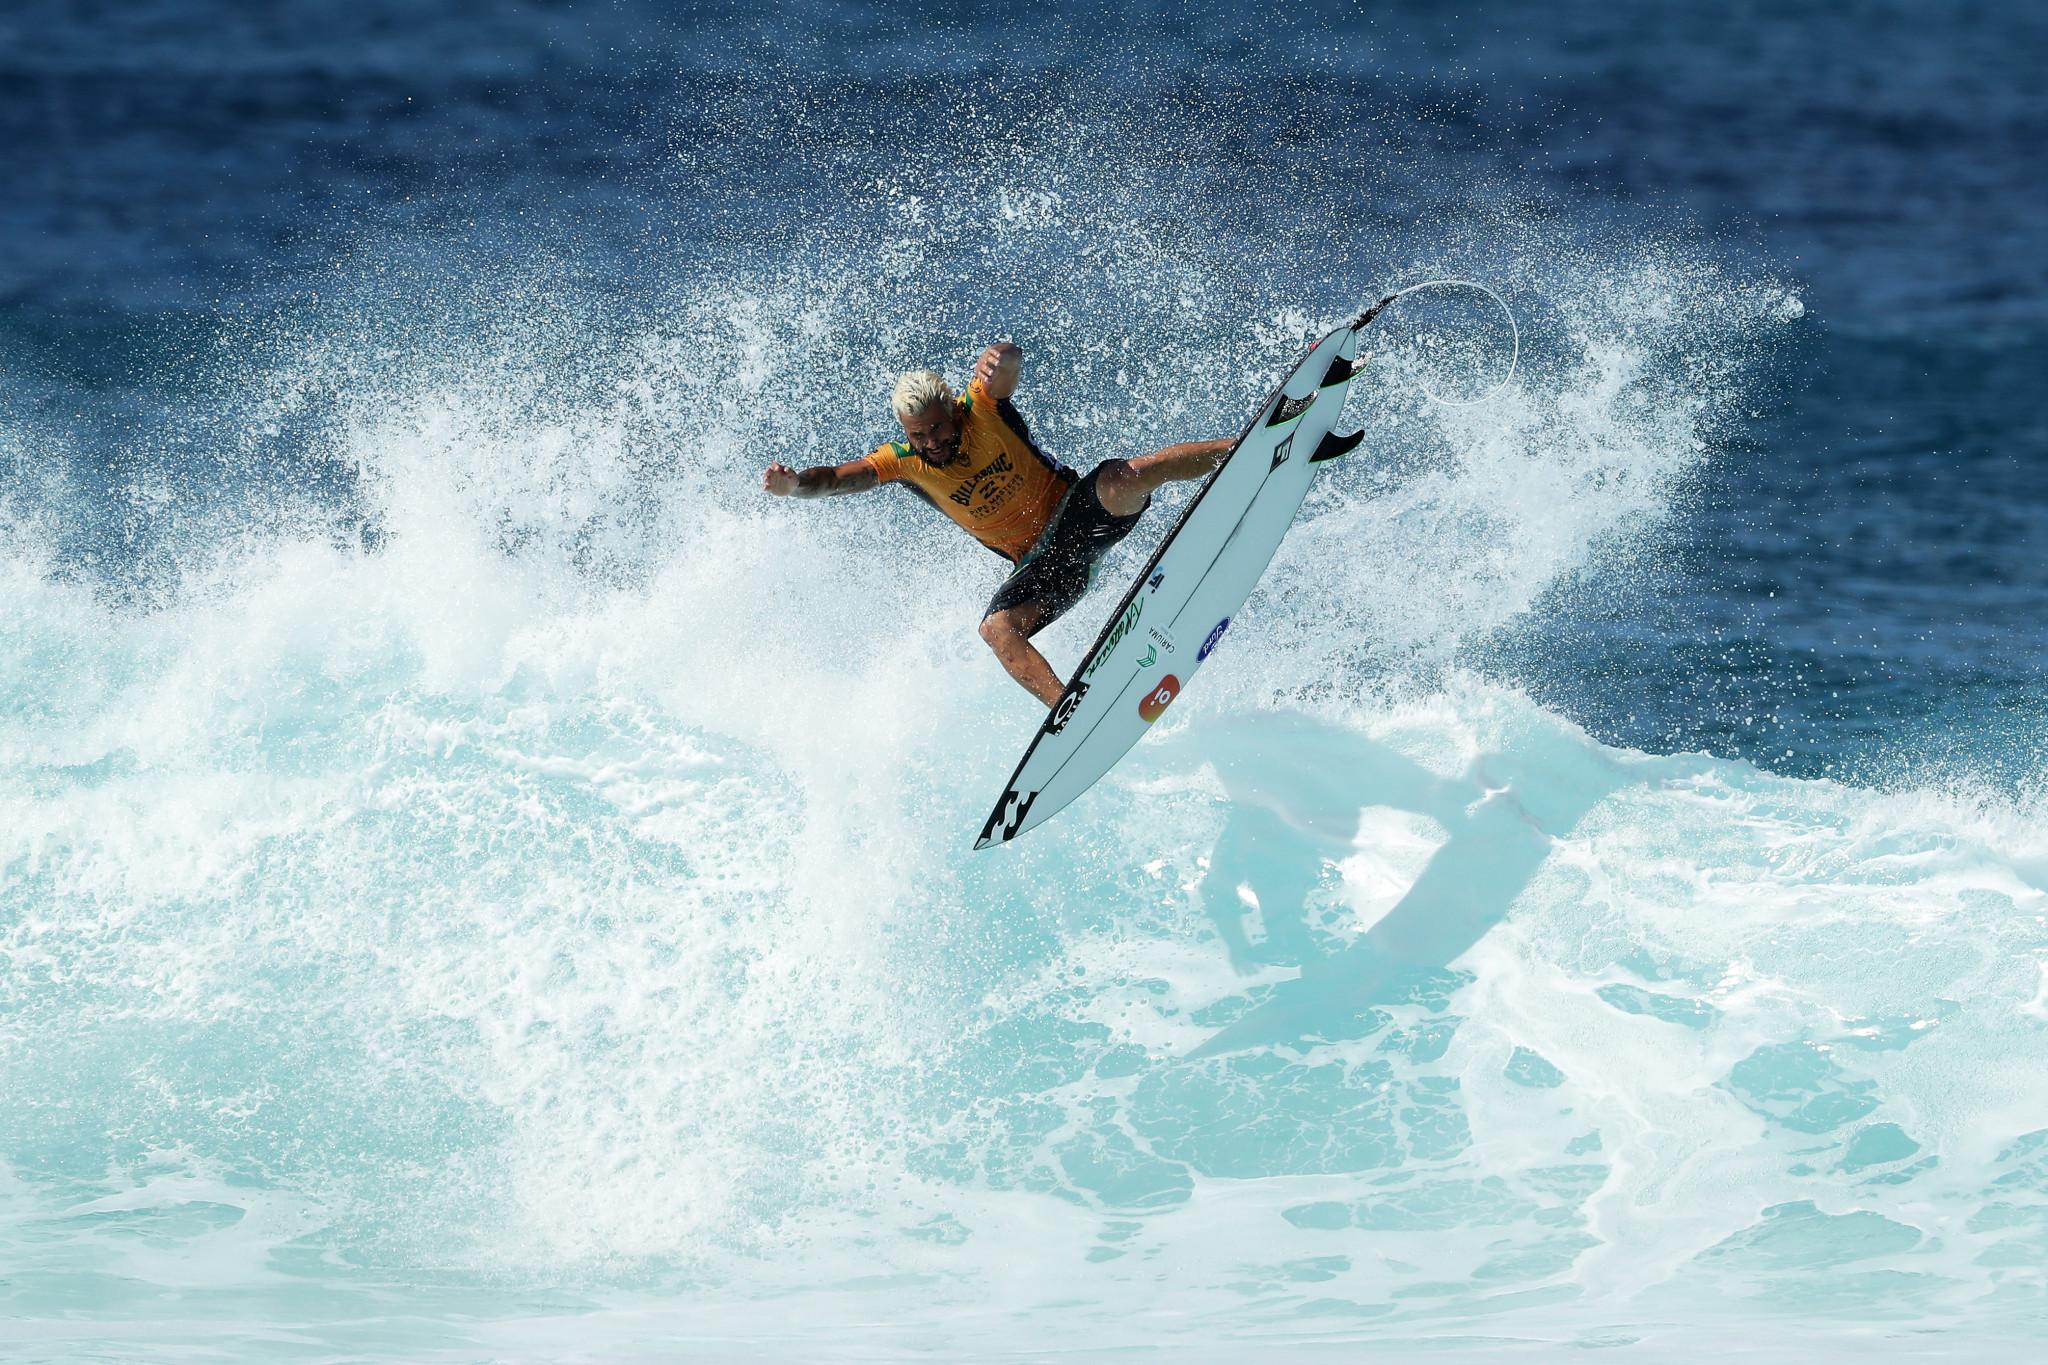 Newcastle poised to launch World Surf League's four-leg Australian swing